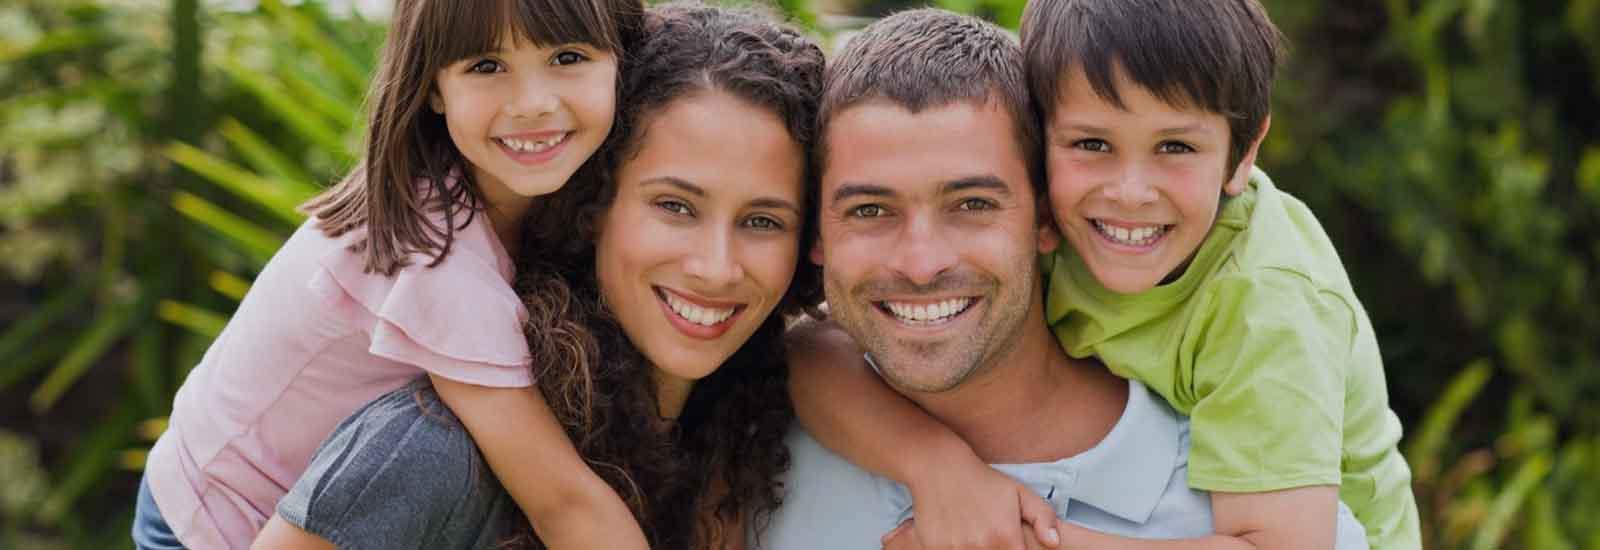 Texas Whole Life Insurance